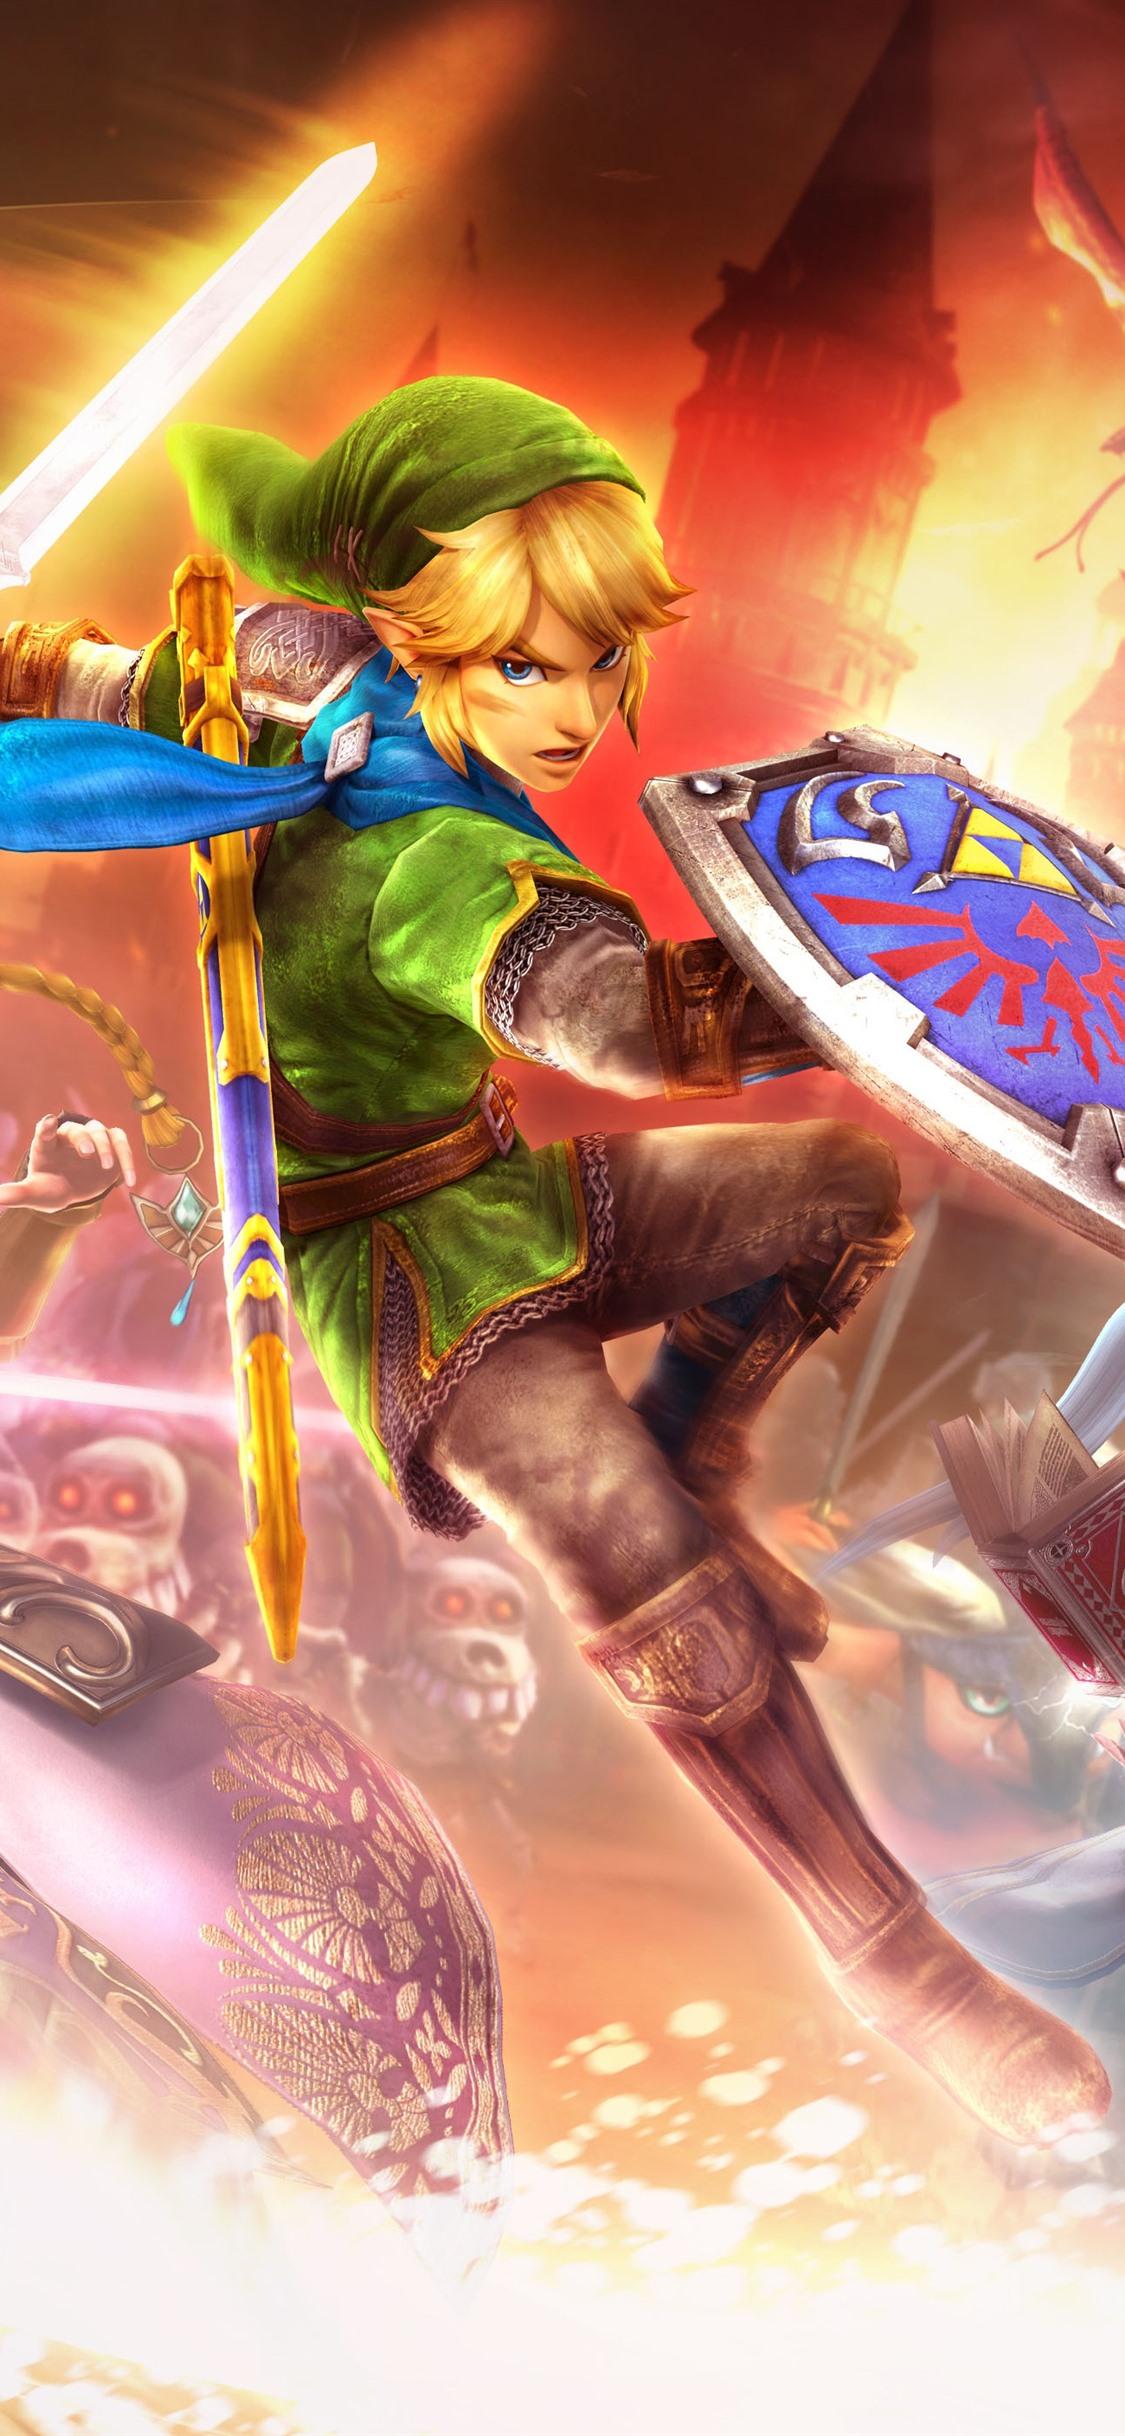 Wallpaper Legend Of Zelda Pc Game 3840x2160 Uhd 4k Picture Image